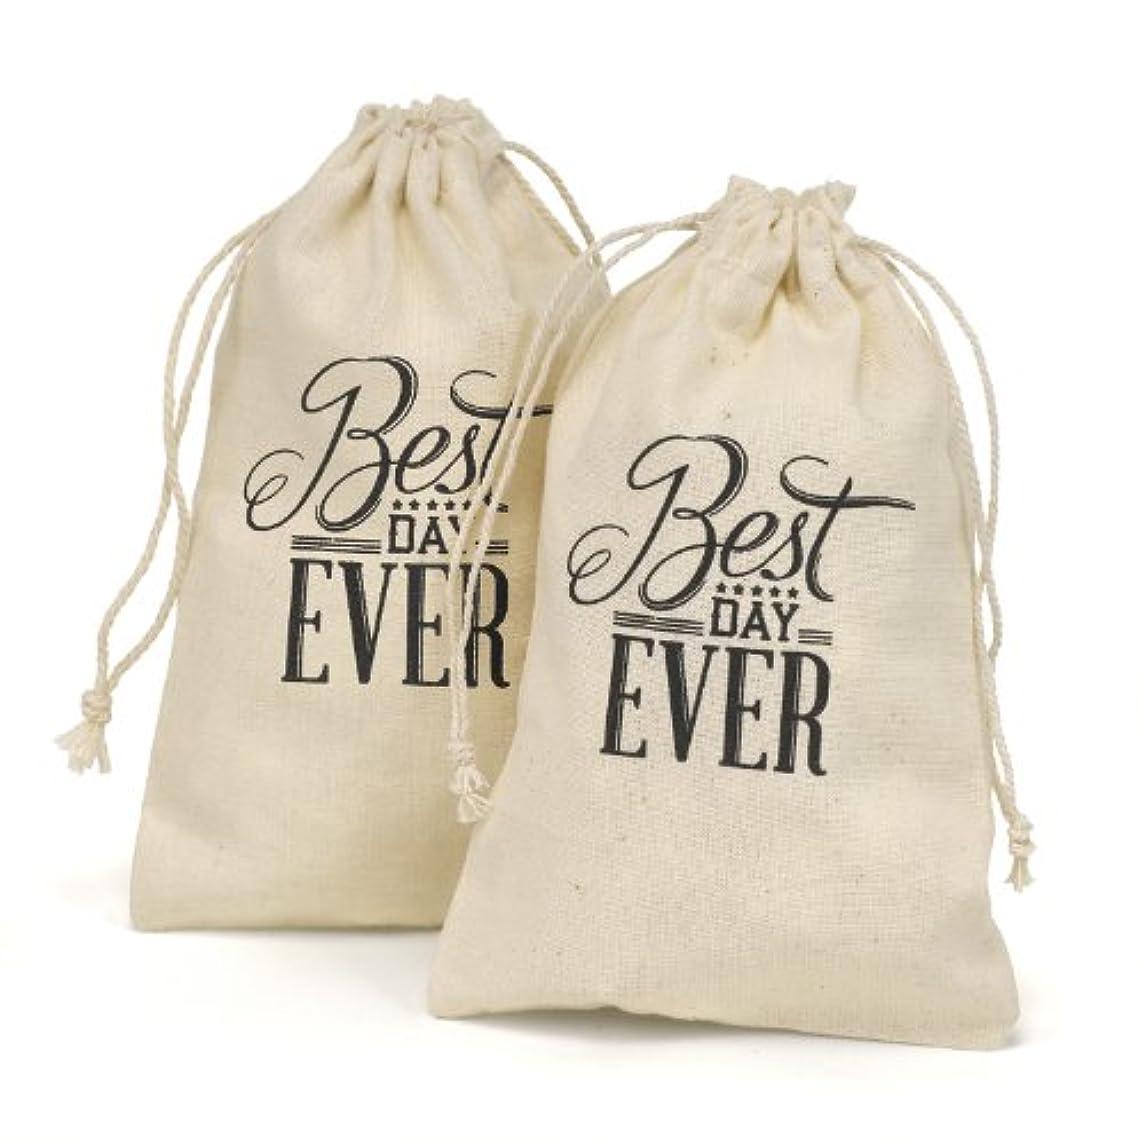 Hortense B. Hewitt 31015 Cotton Favor Bags, 4 x 6-Inches, Best Day Ever